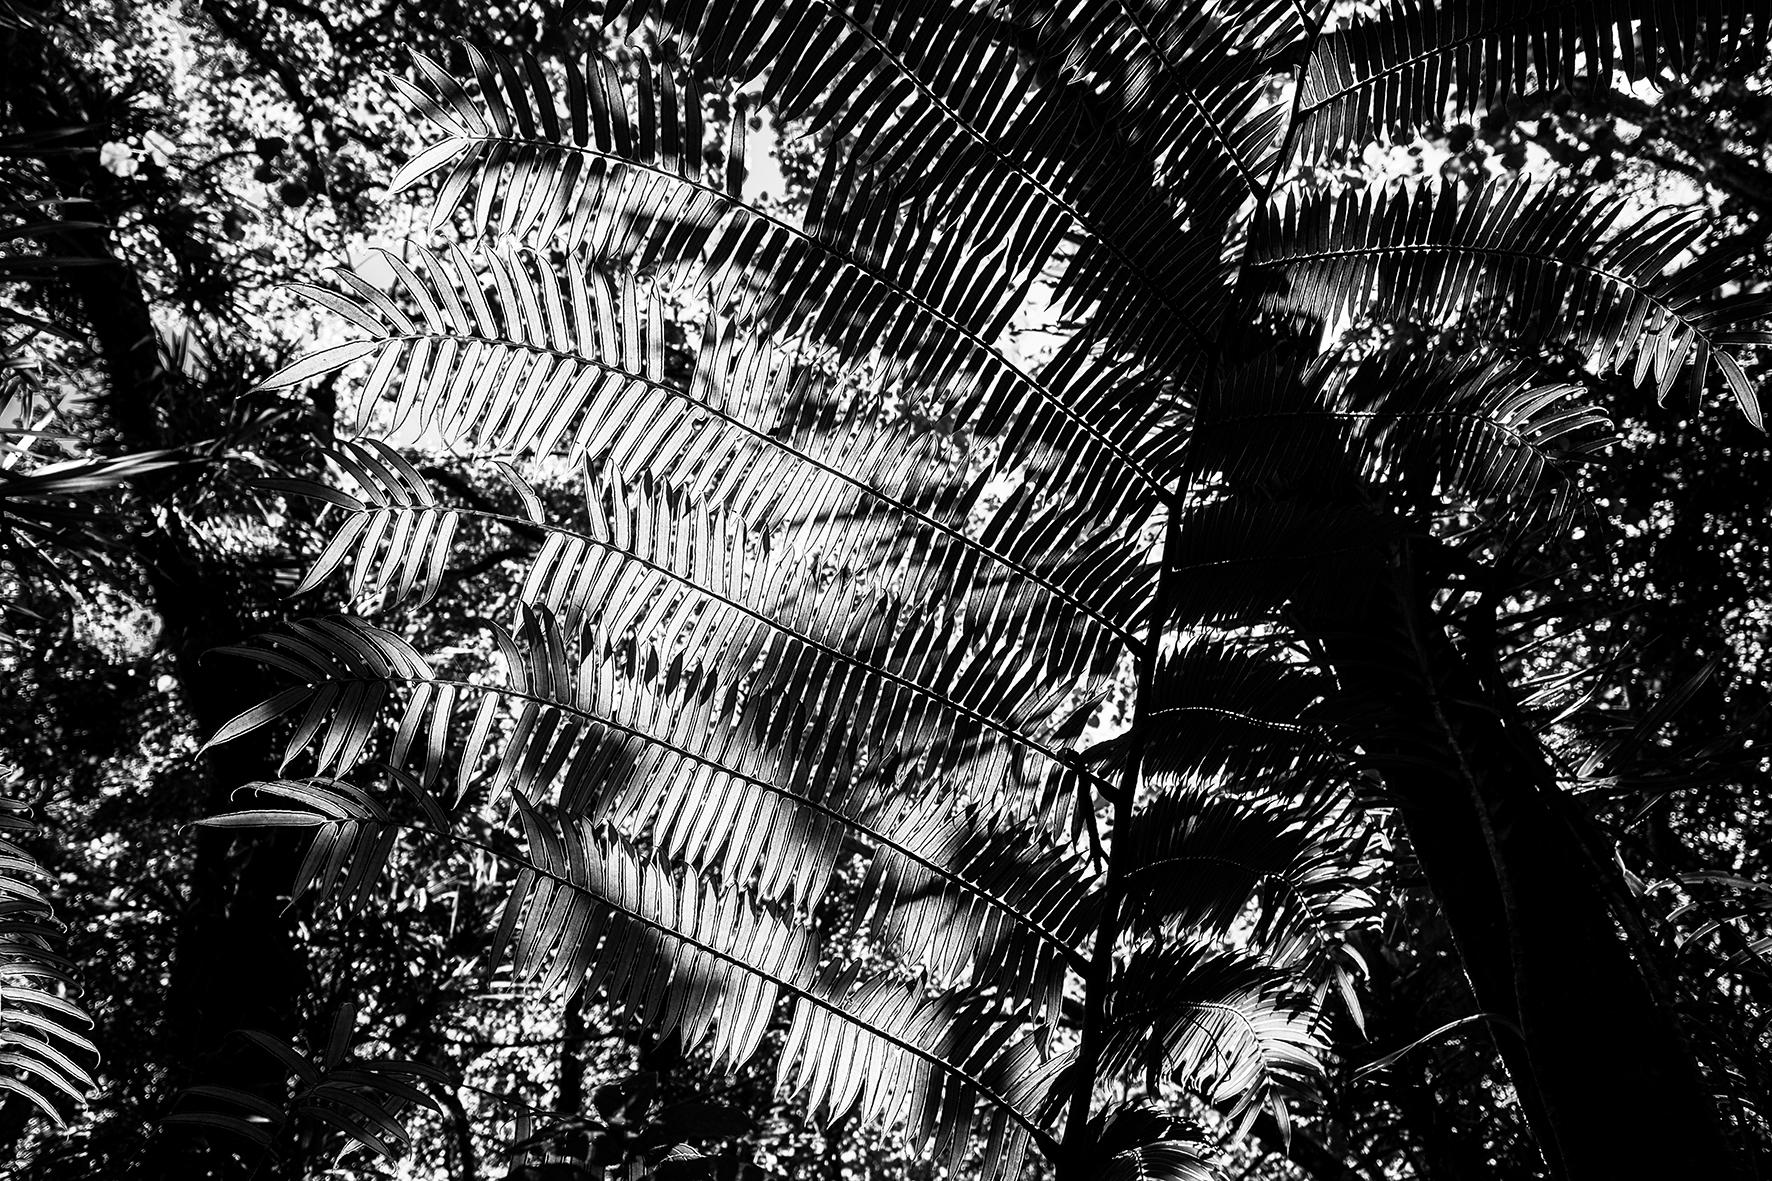 Photographe : Le graphisme naturel n°6